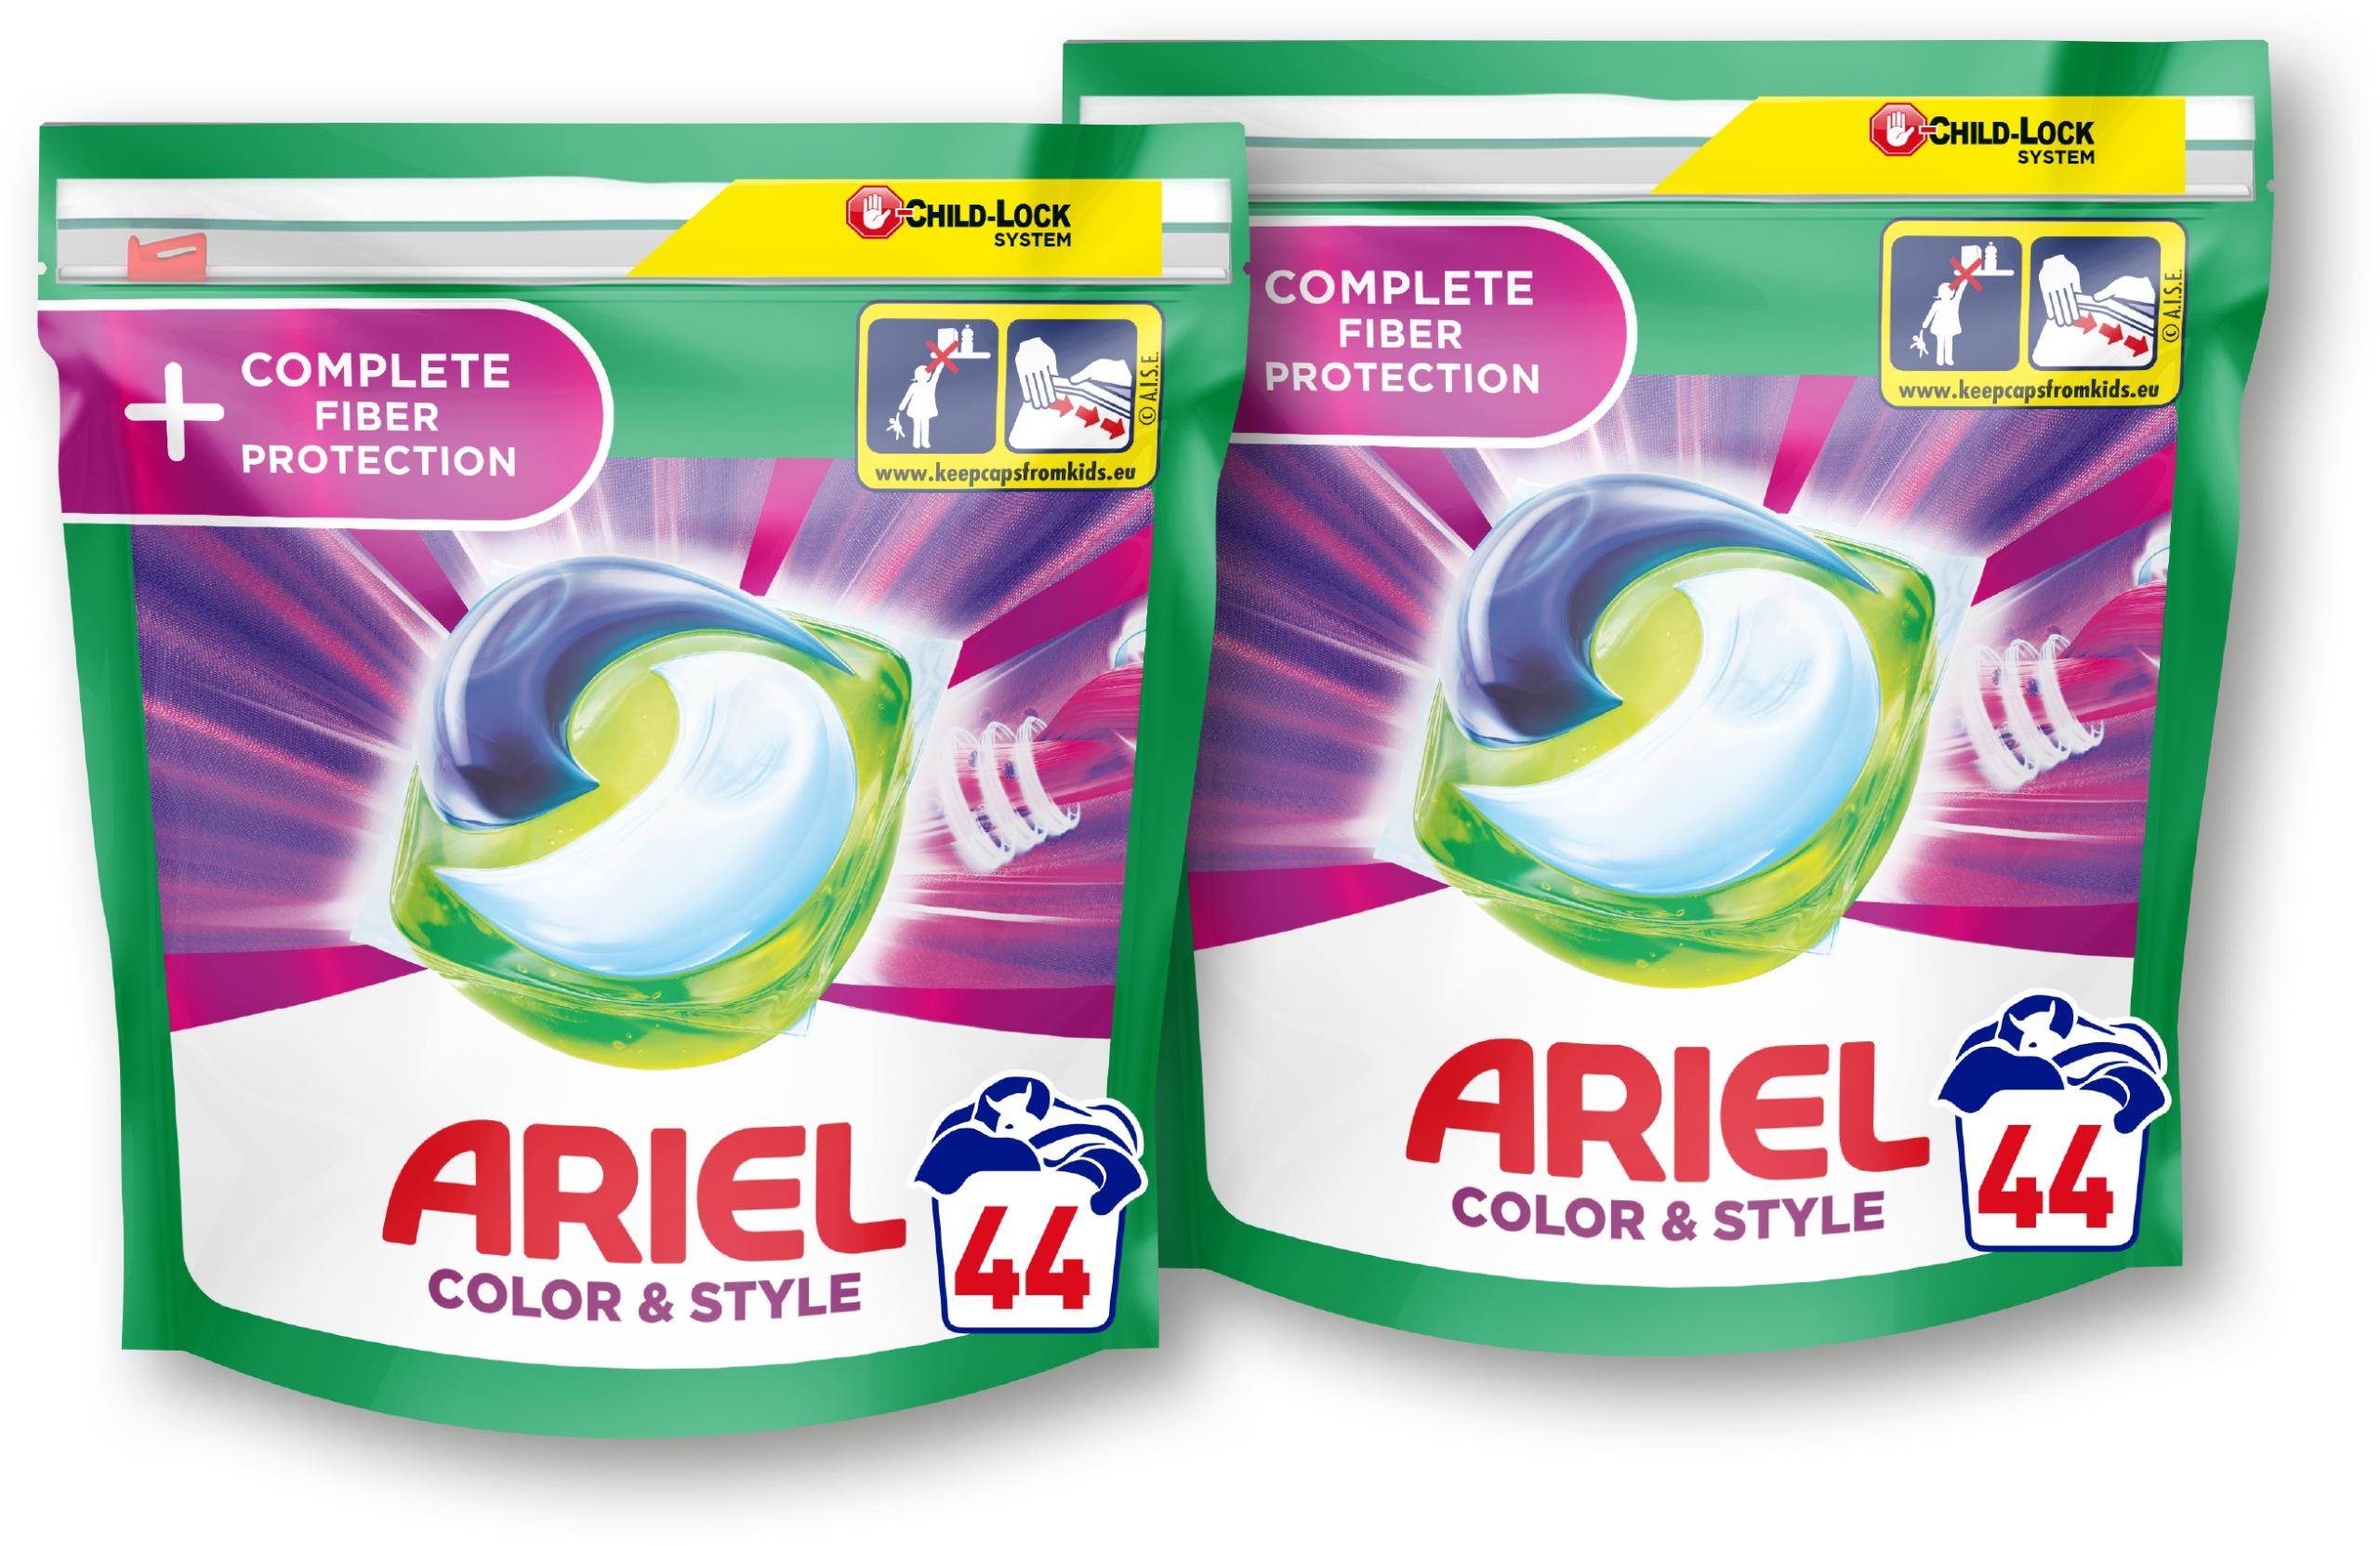 Ariel kapsułki do prania Plus Complete 2x44 szt